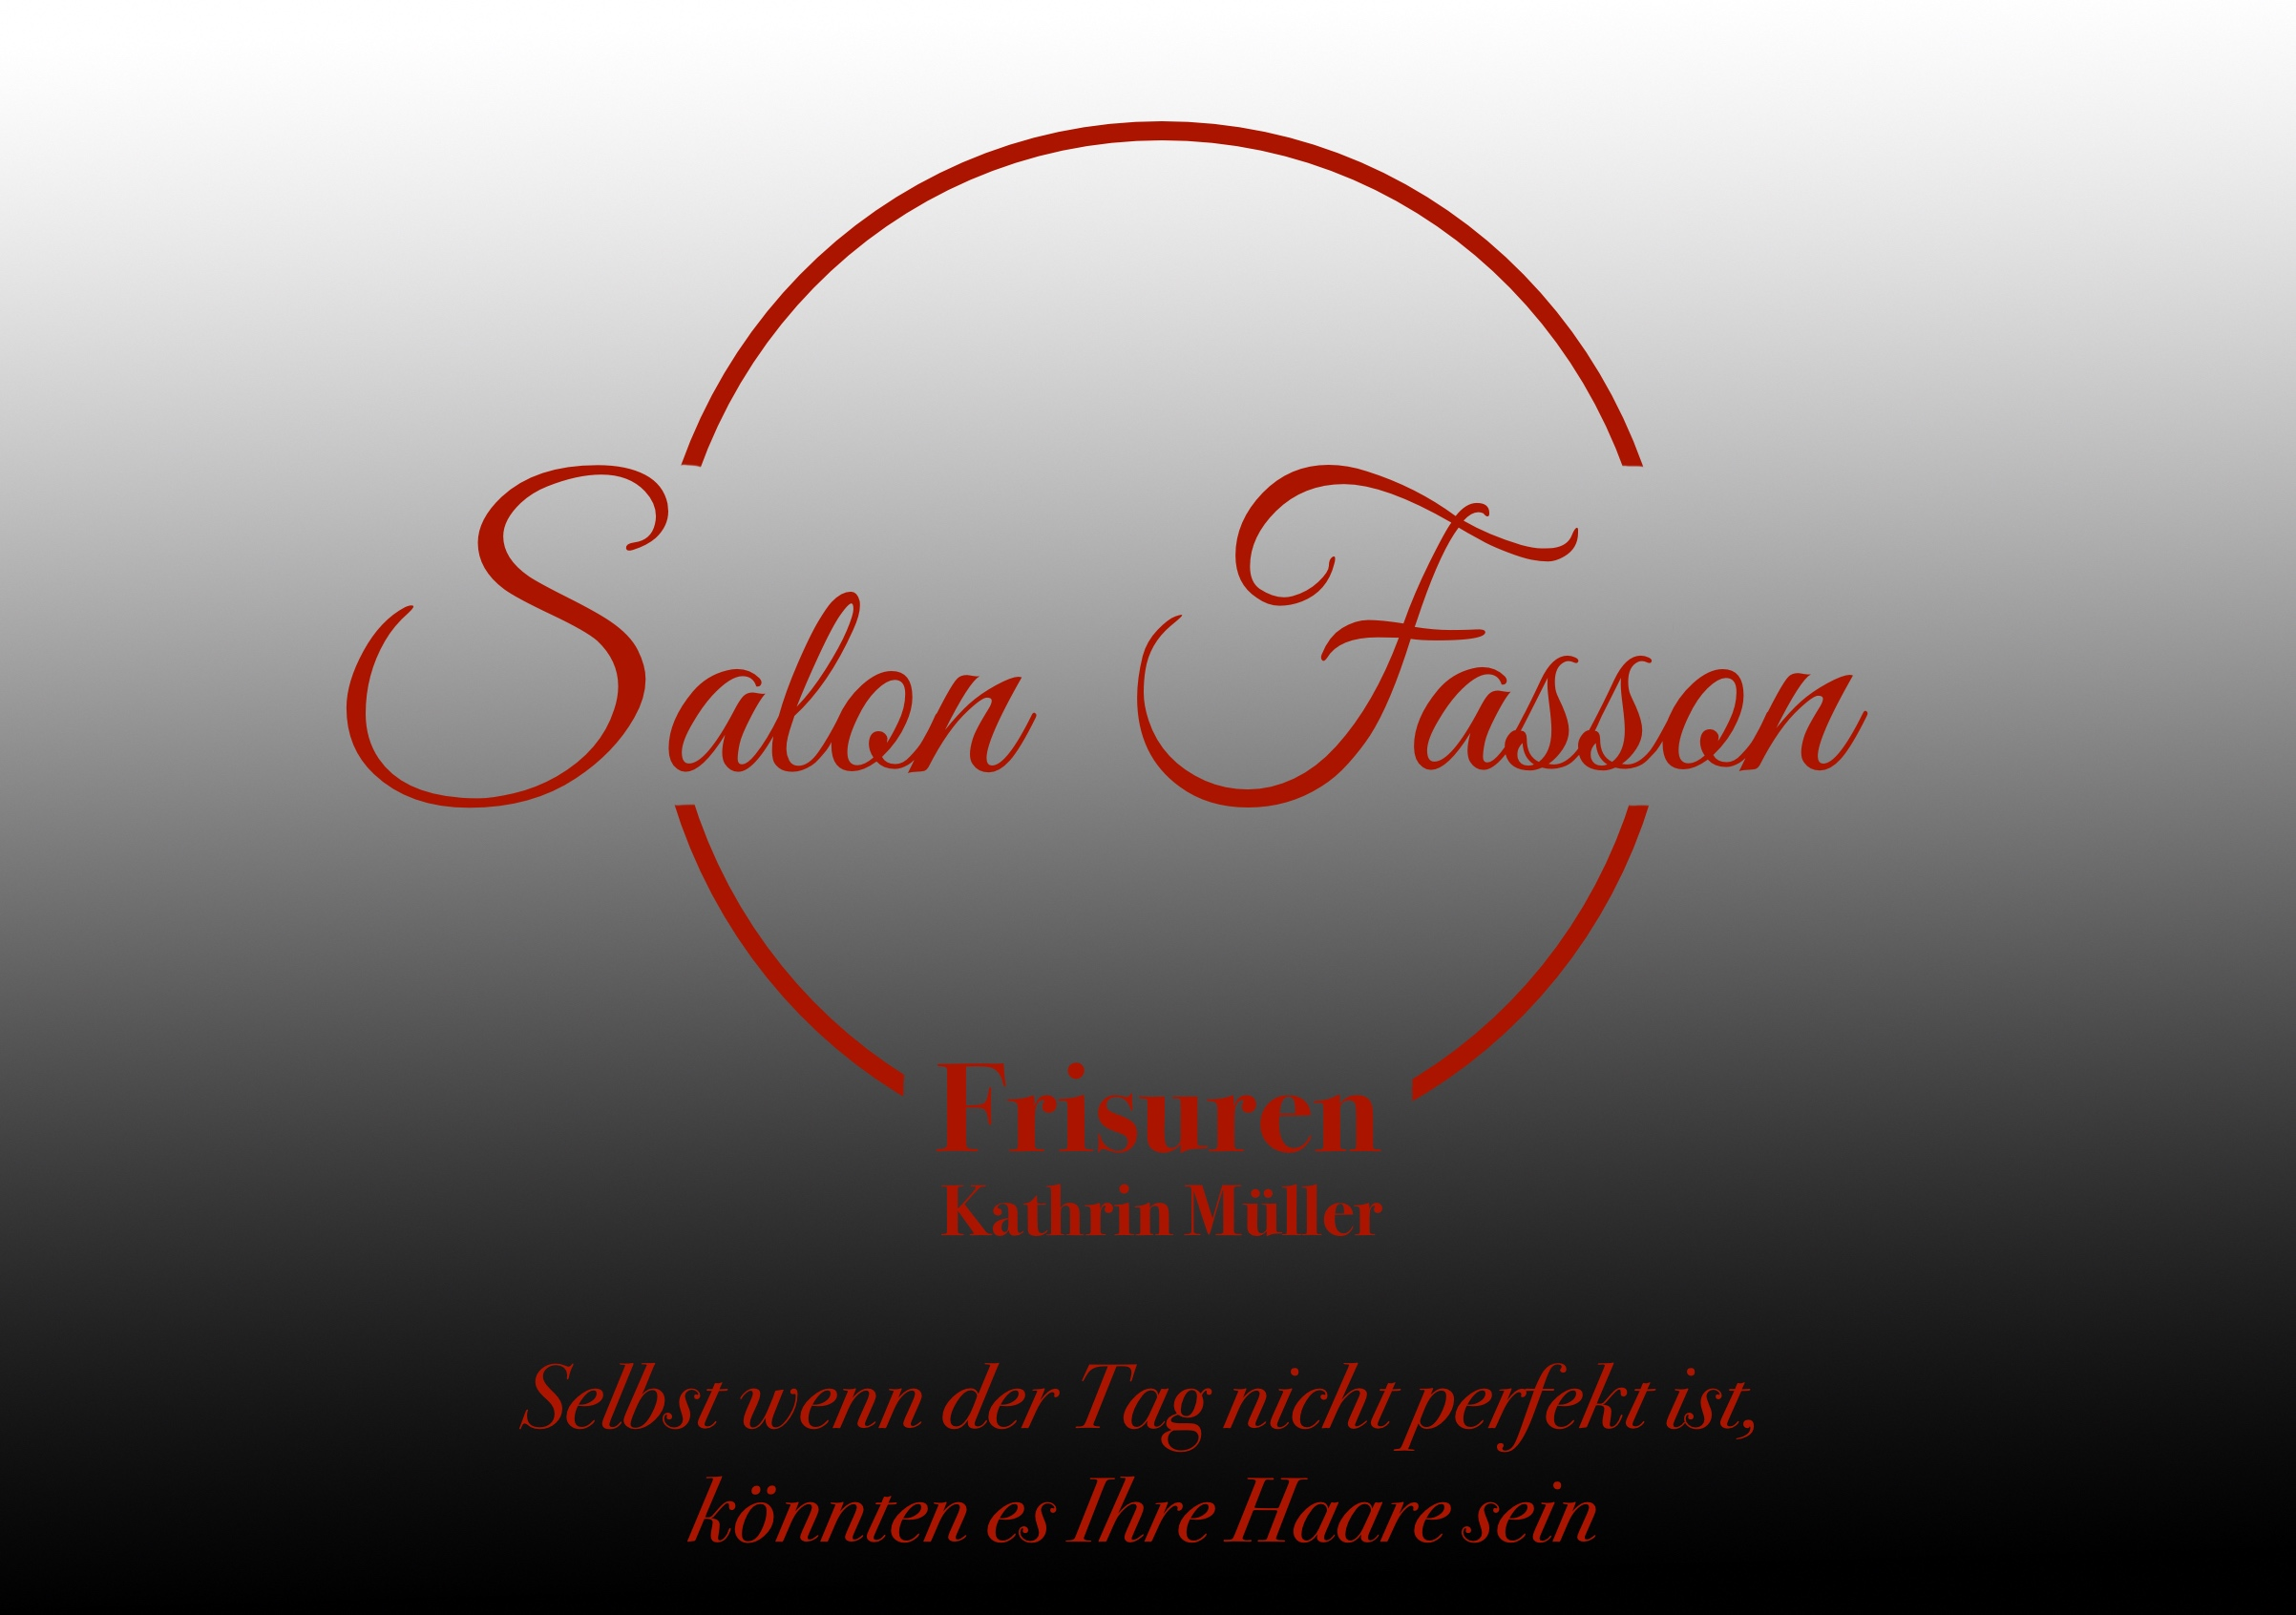 Salon Fasson - Kathrin Müller - Berlin-Spandau